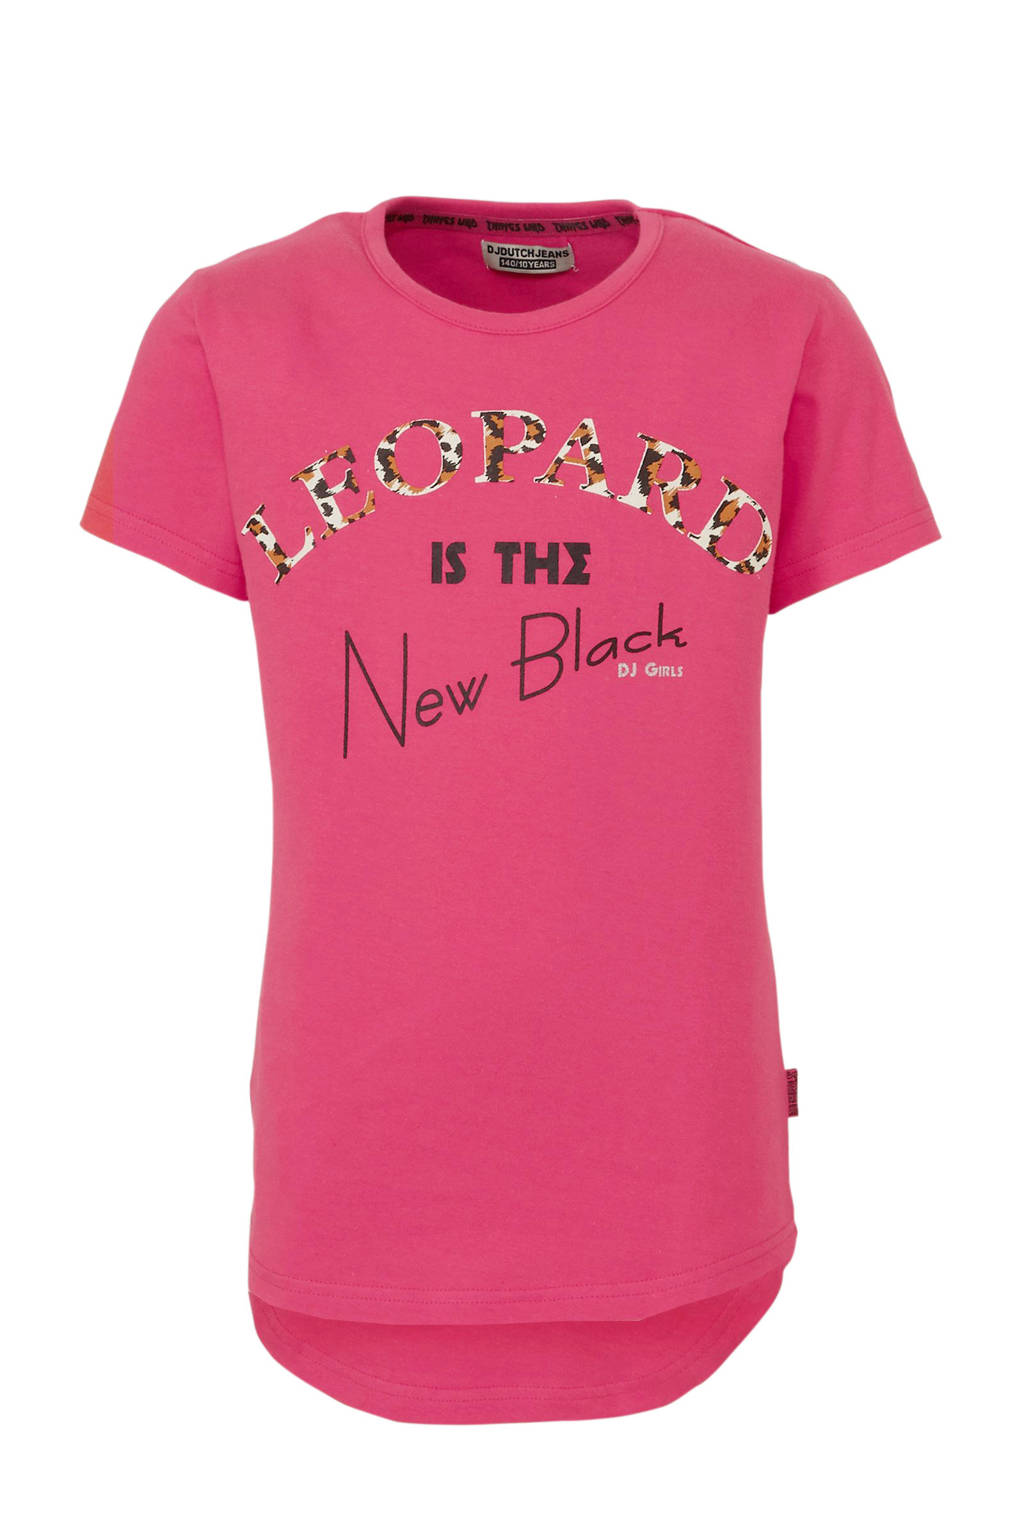 DJ Dutchjeans T-shirt met tekst roze/zwart/bruin, Roze/zwart/bruin